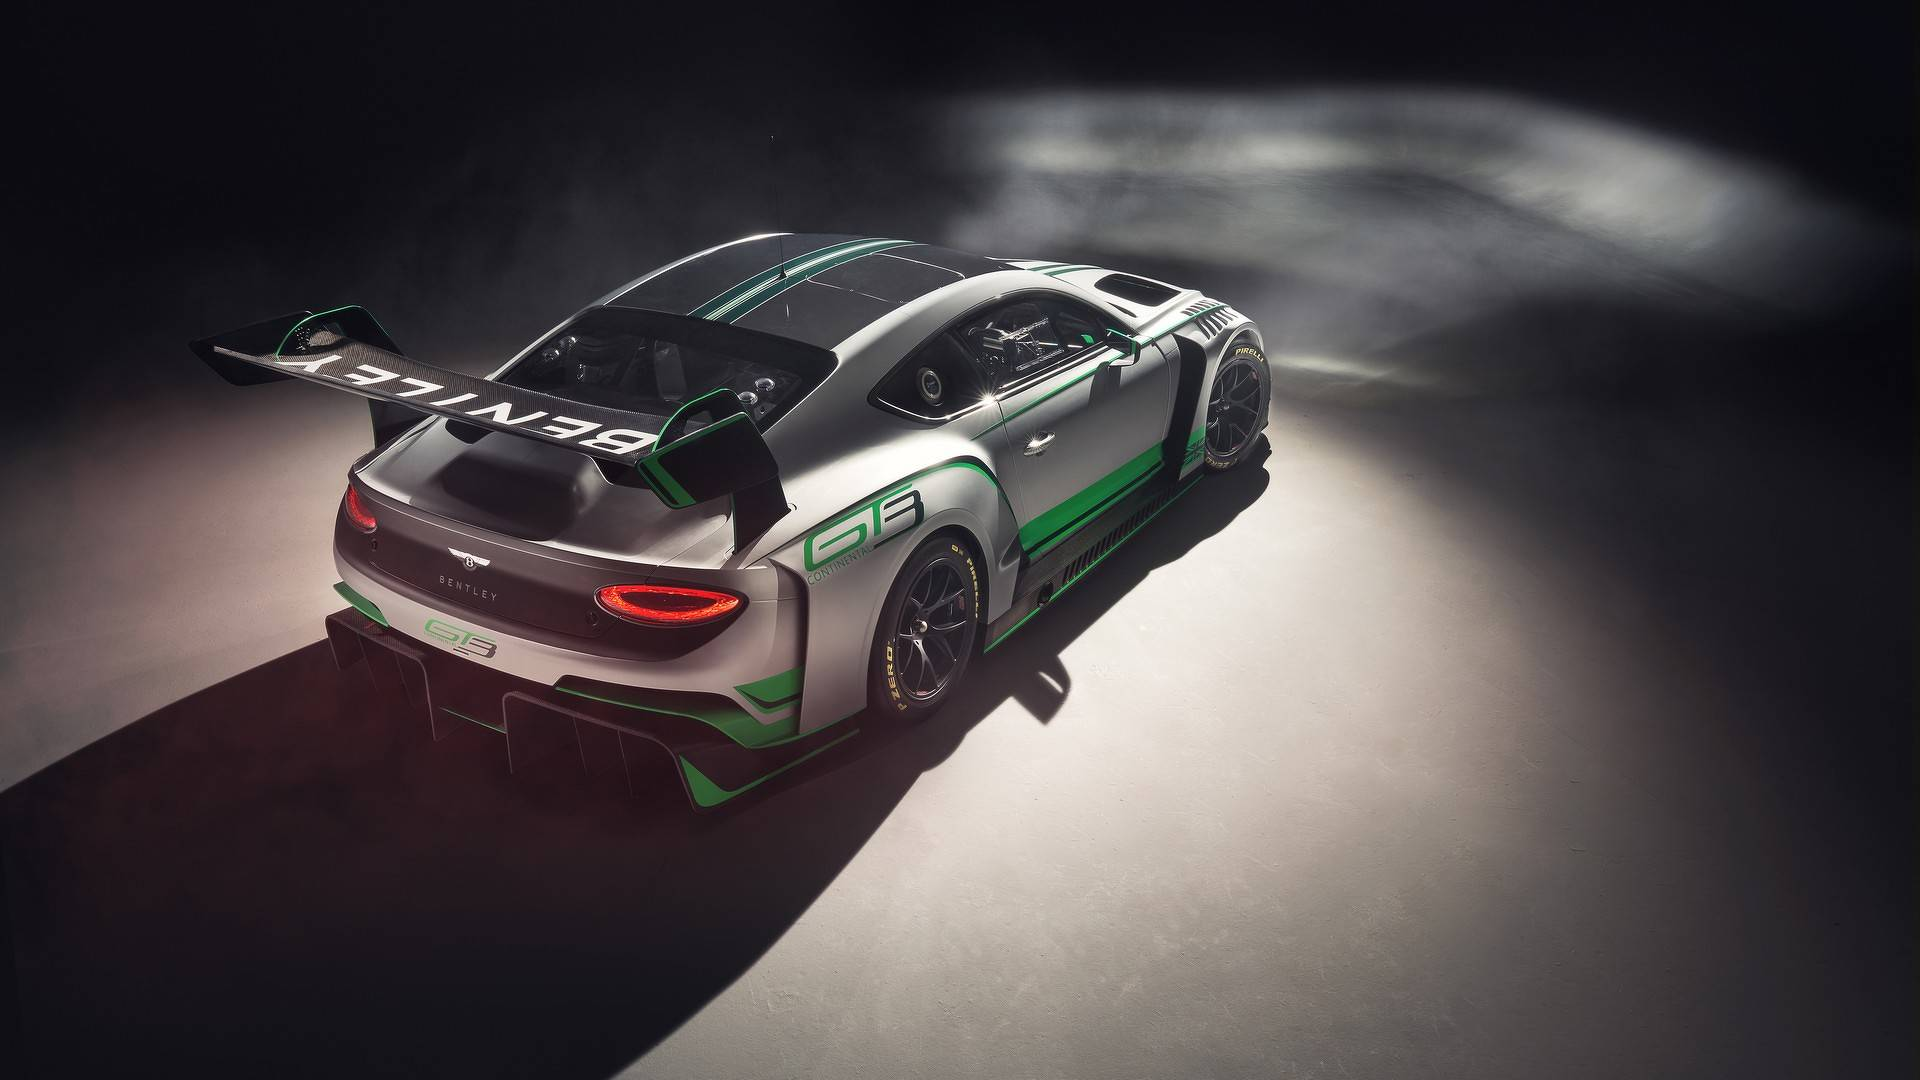 2018-bentley-continental-gt3-race-car (3)